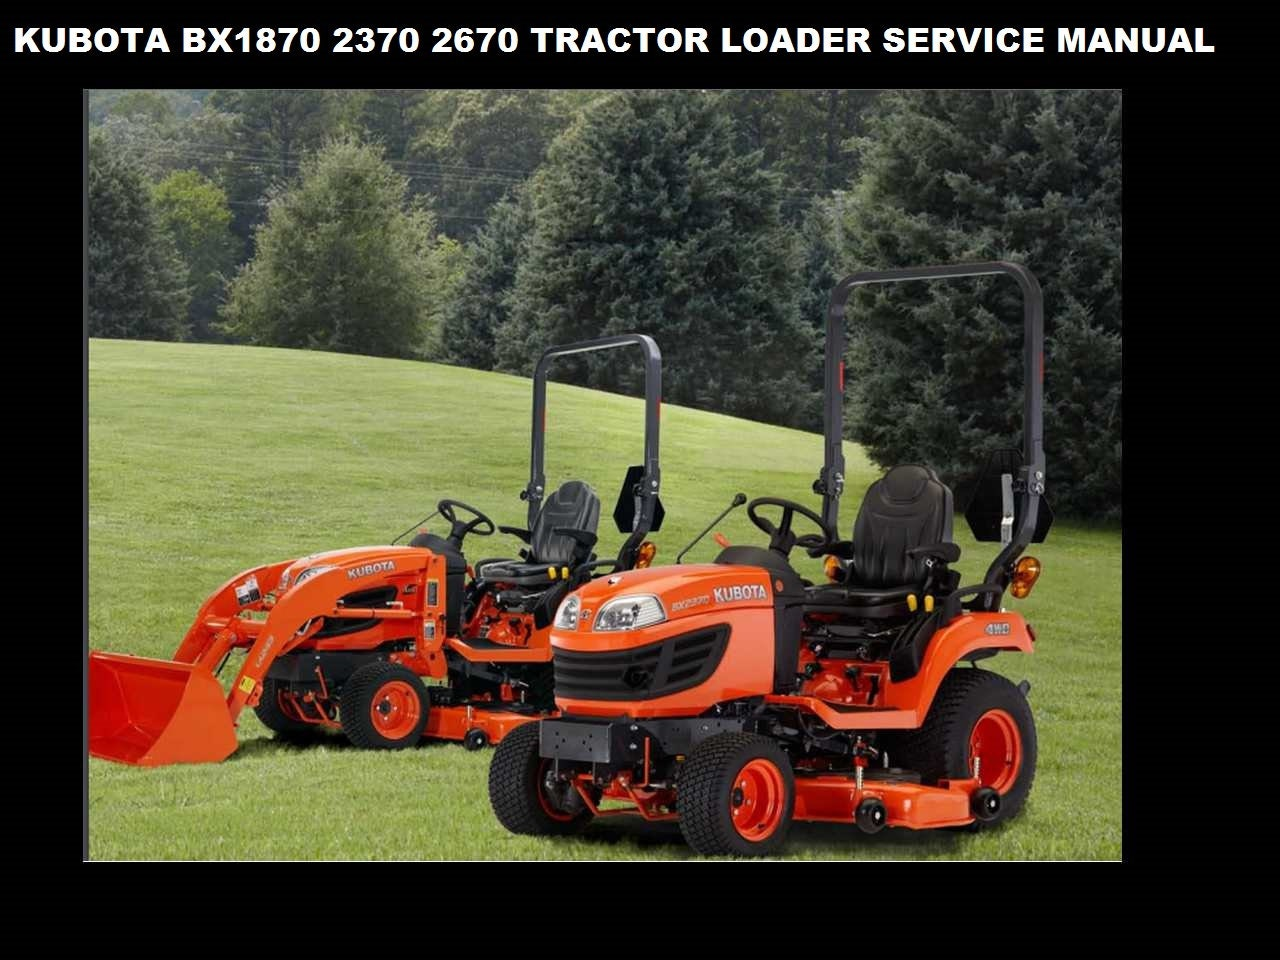 Kubota Bx1870 Bx2370 Bx2670 Tractor Service Manual 440pg Etsy G1800 Wiring Diagram